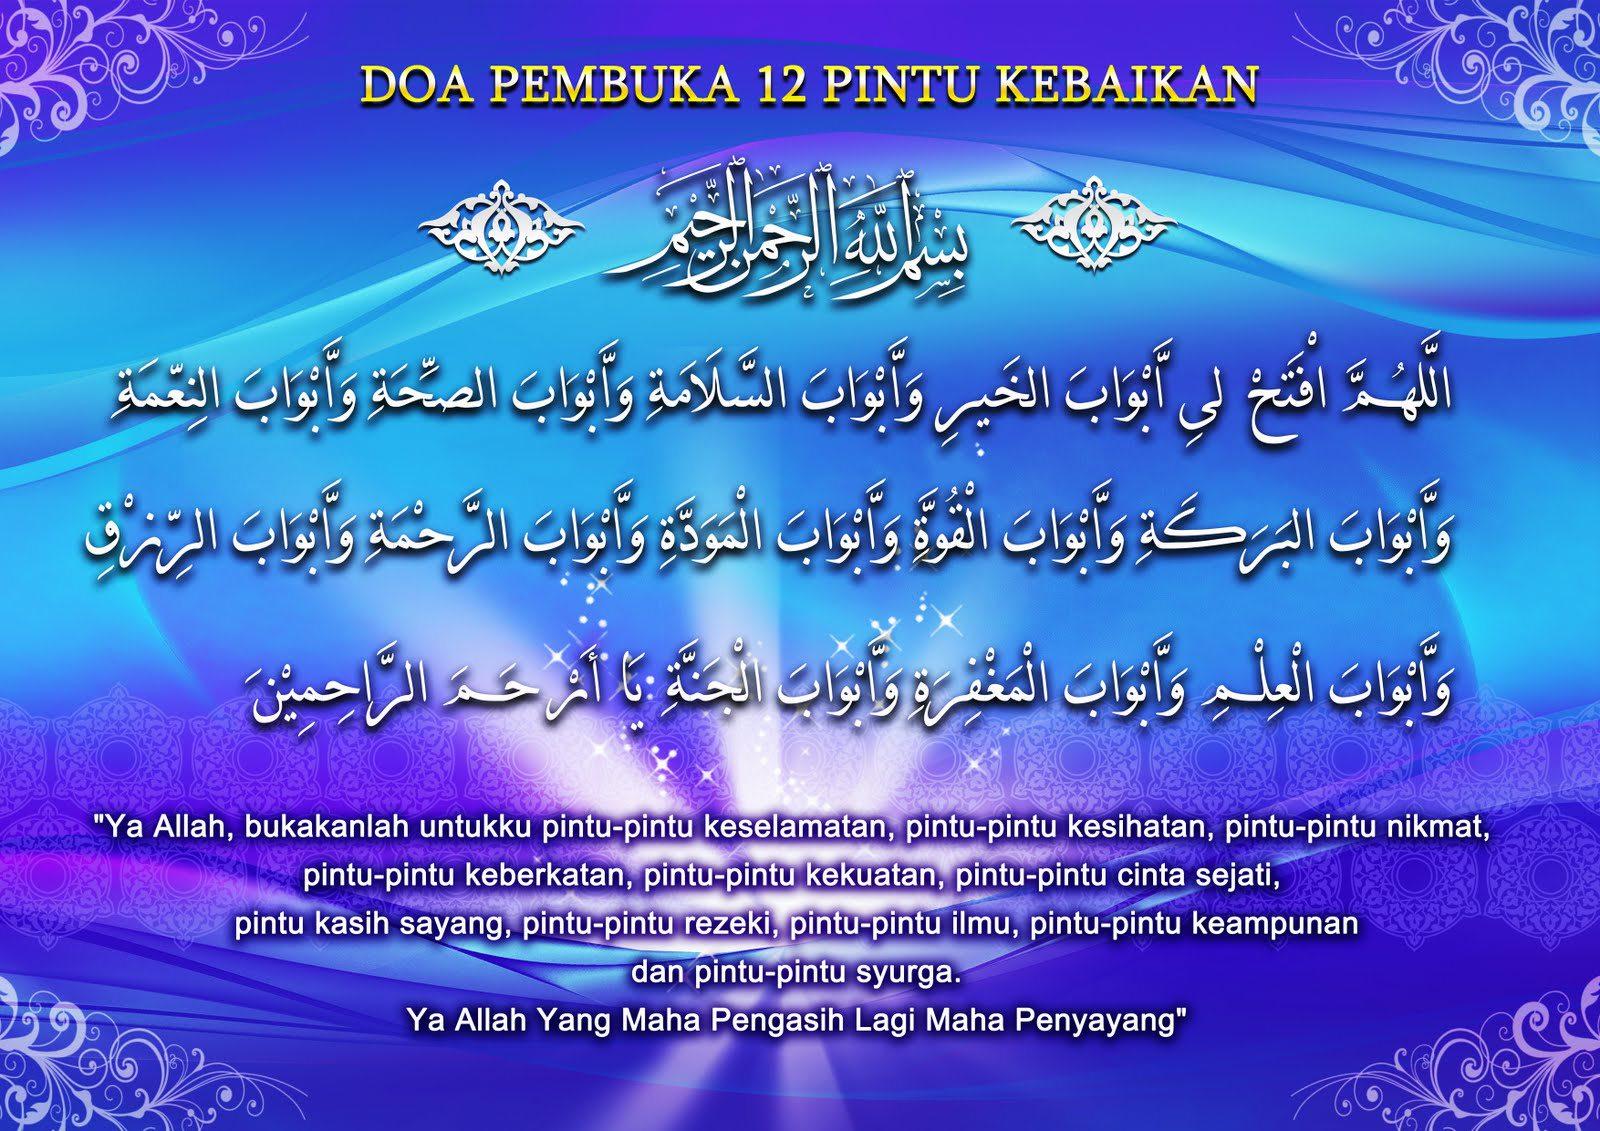 Doa Pembuka Kata Doa Pembuka 12 Pintu Kebaikan